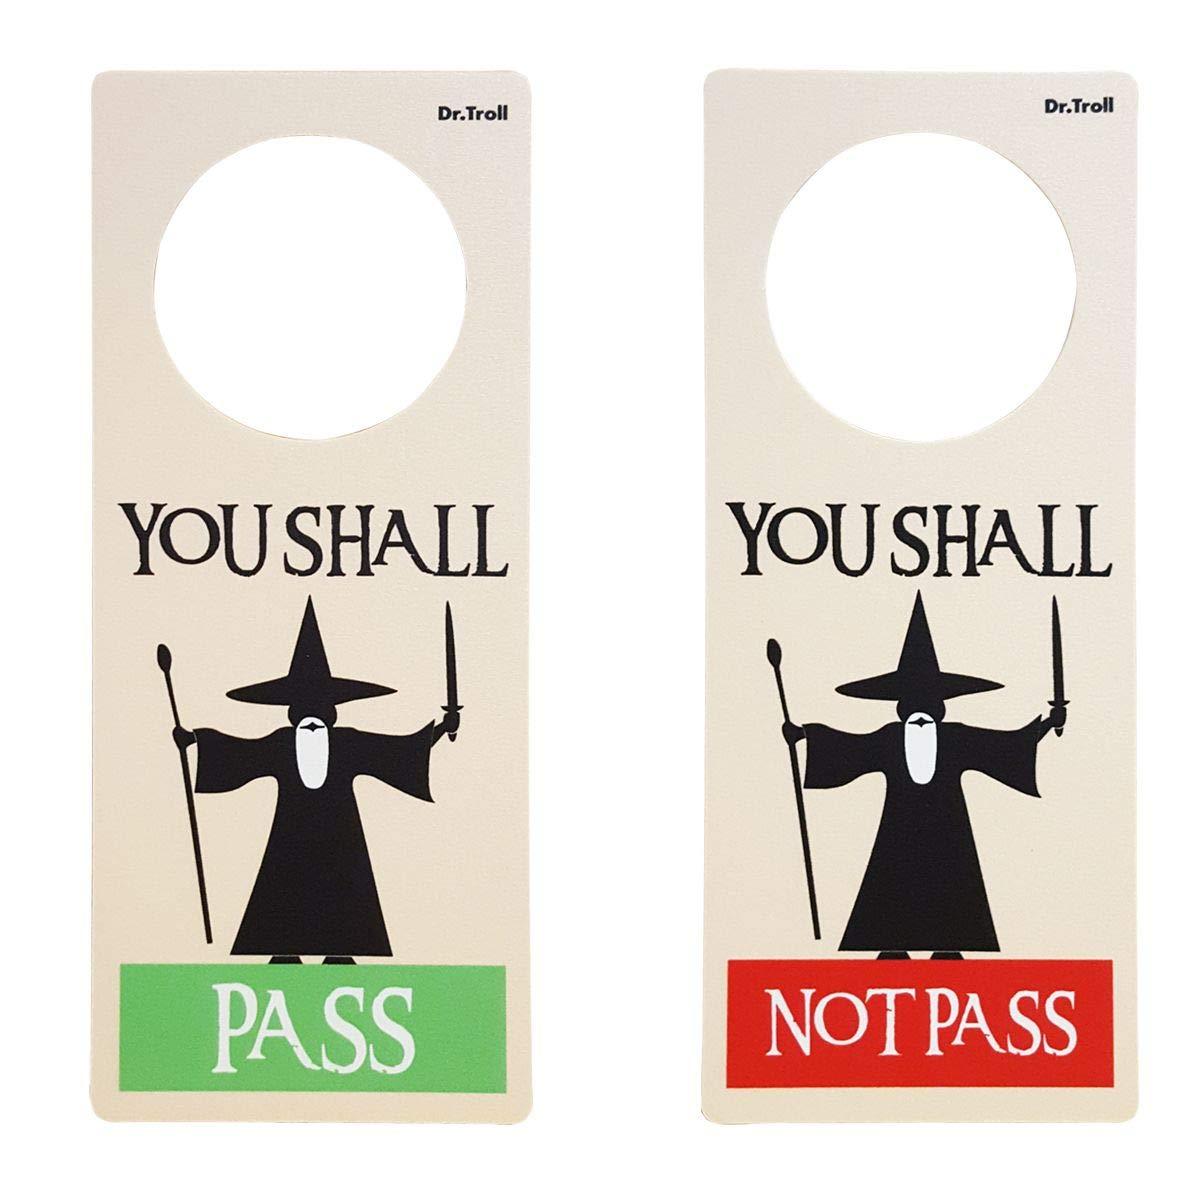 Troll POMING Cartel NO Molestar Colgador para POMO Puertas HABITACI/ÓN Tipo DO Not Disturb Gandalf You Shall Pass You Shall Not Pass Dr